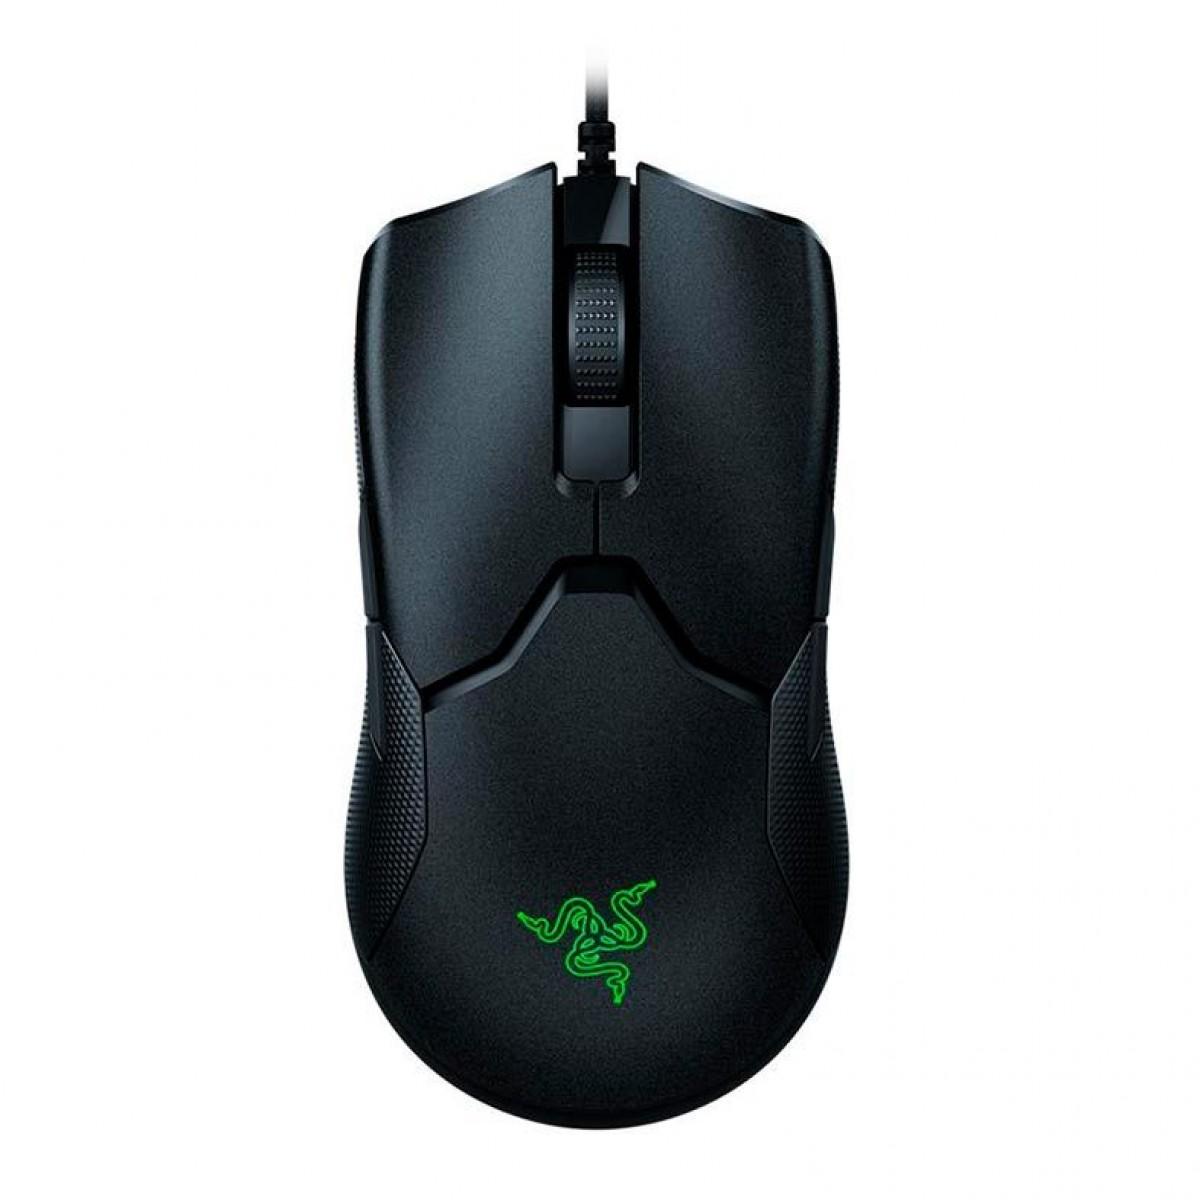 Mouse Gamer Razer Viper 8KHz,8 Botões Programáveis, 20.000 DPI, RGB, RZ01-03580100-R3U1